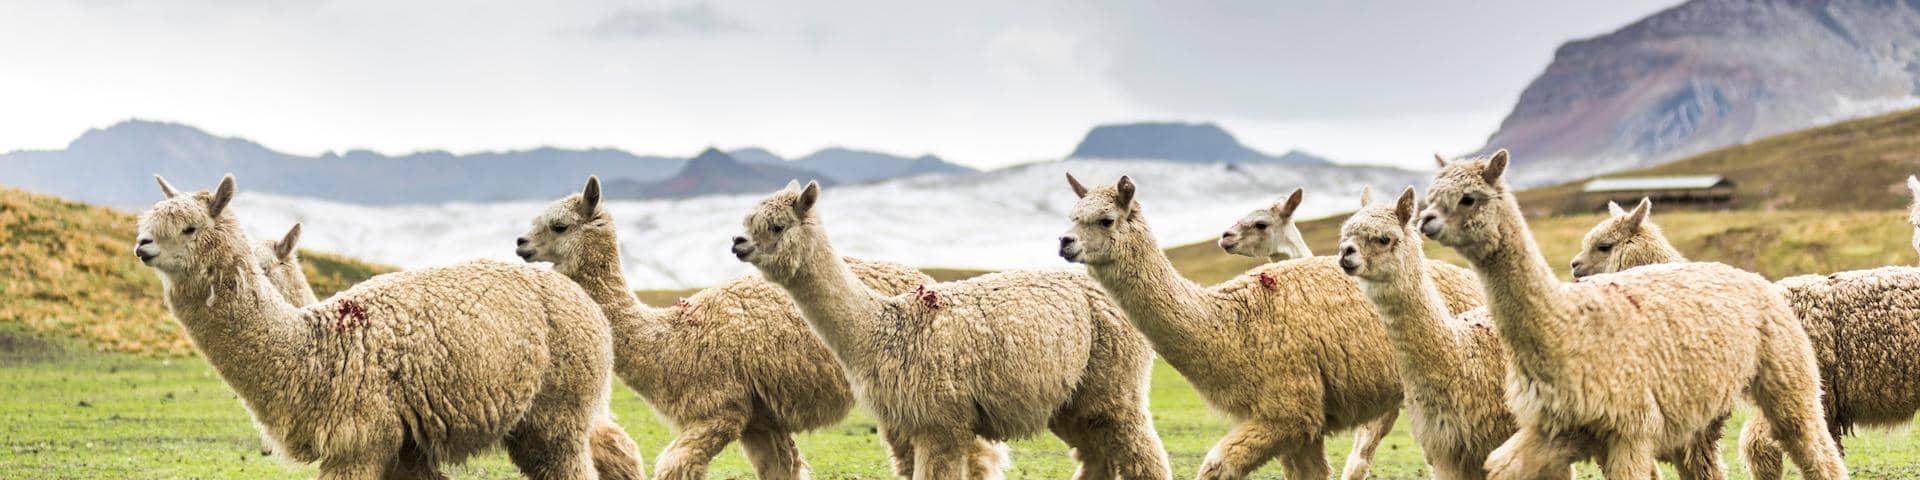 Alpaca herd Peru wool